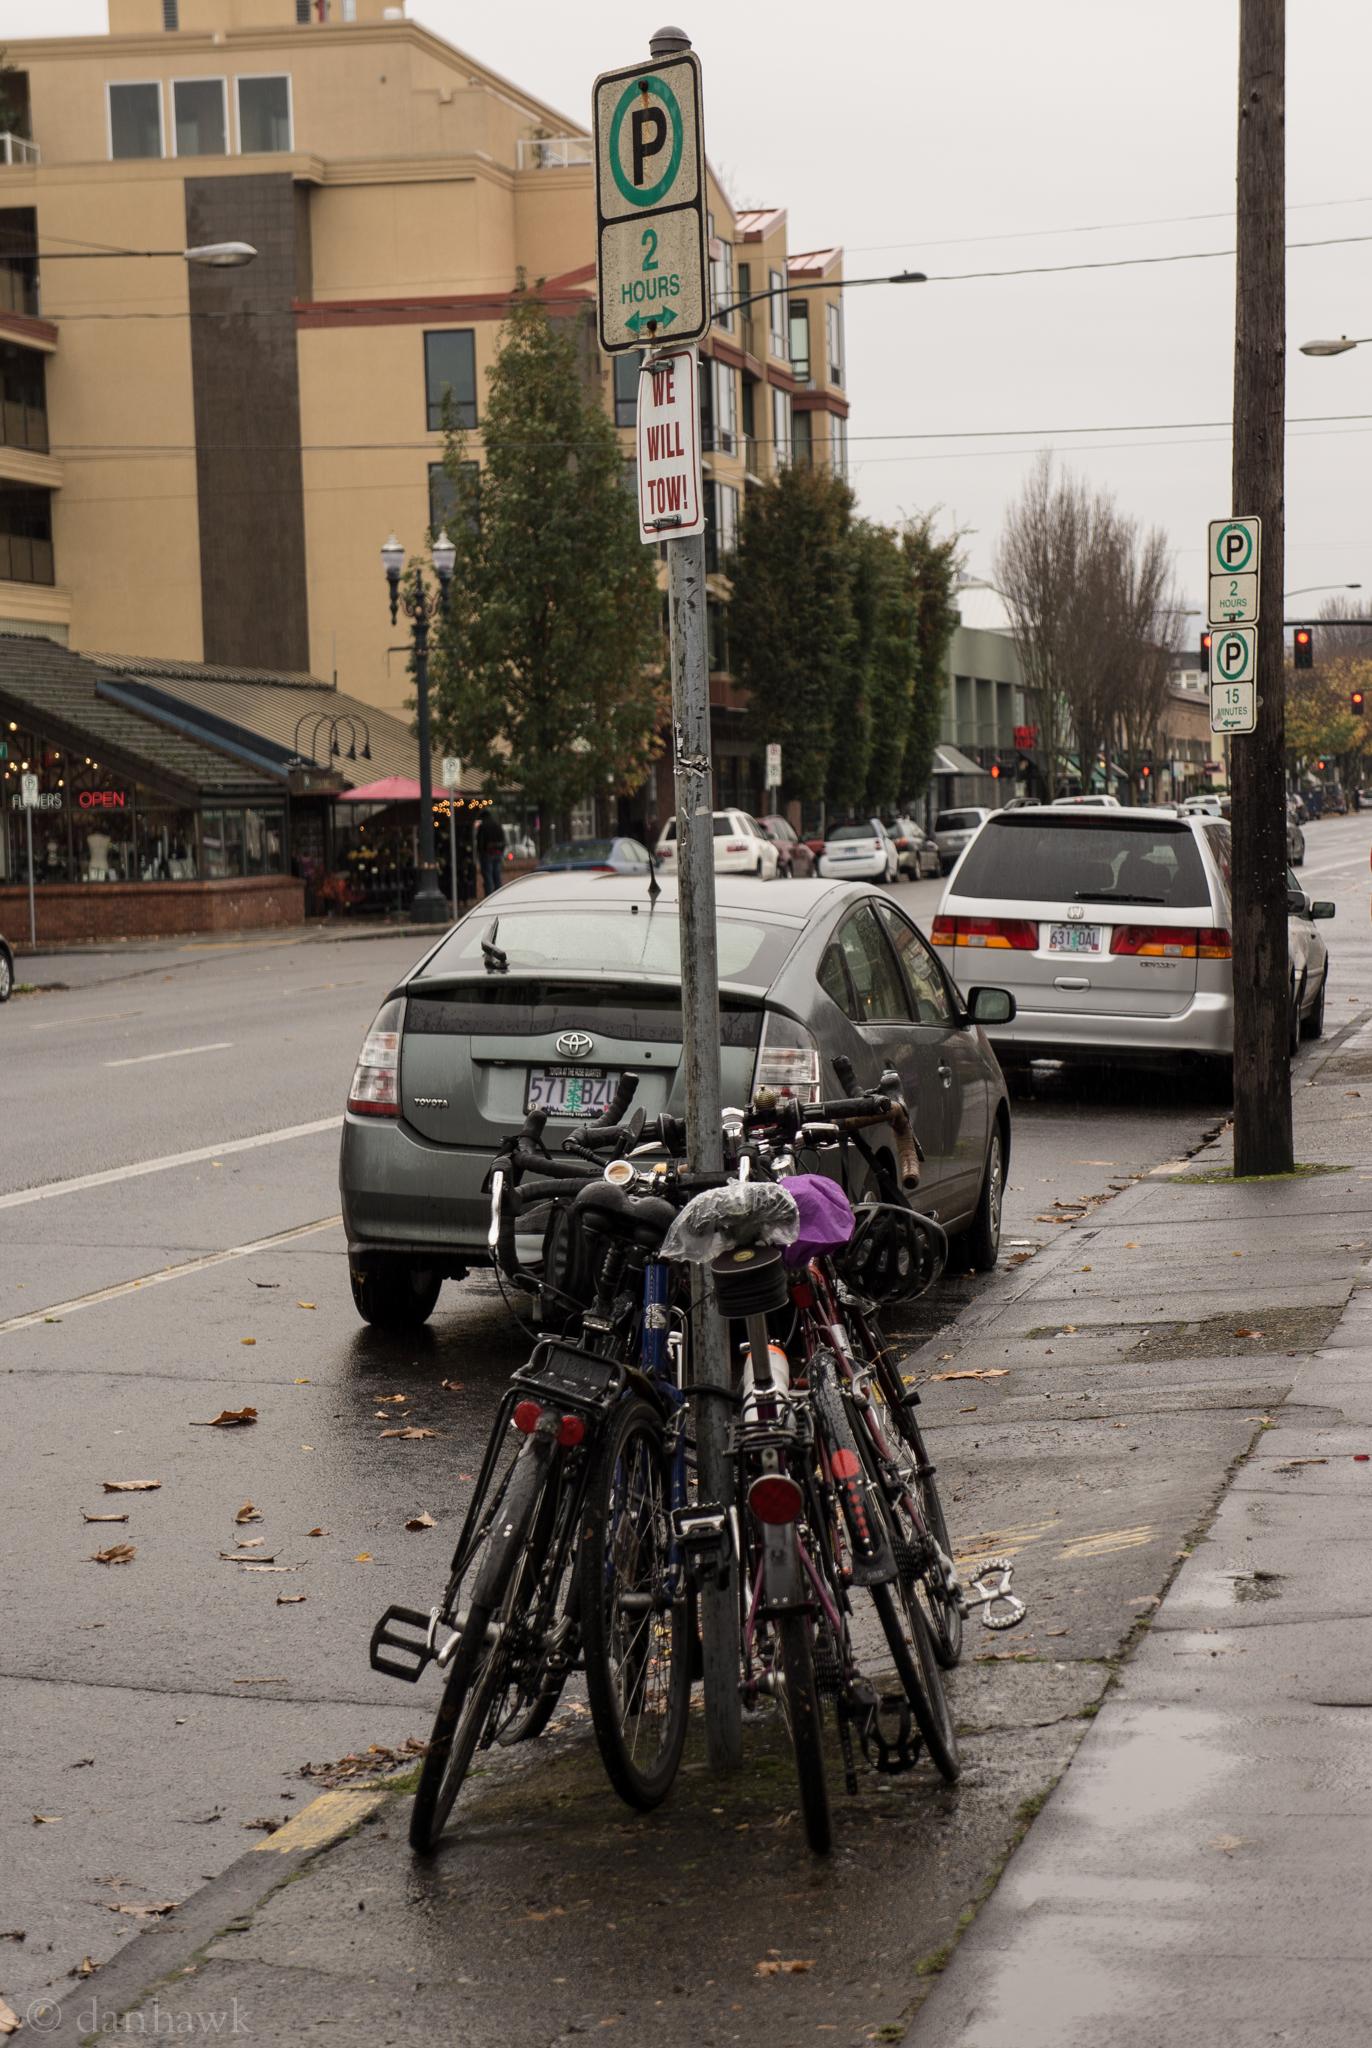 Bike Rack | 365 Project | Nov 11th, 2012